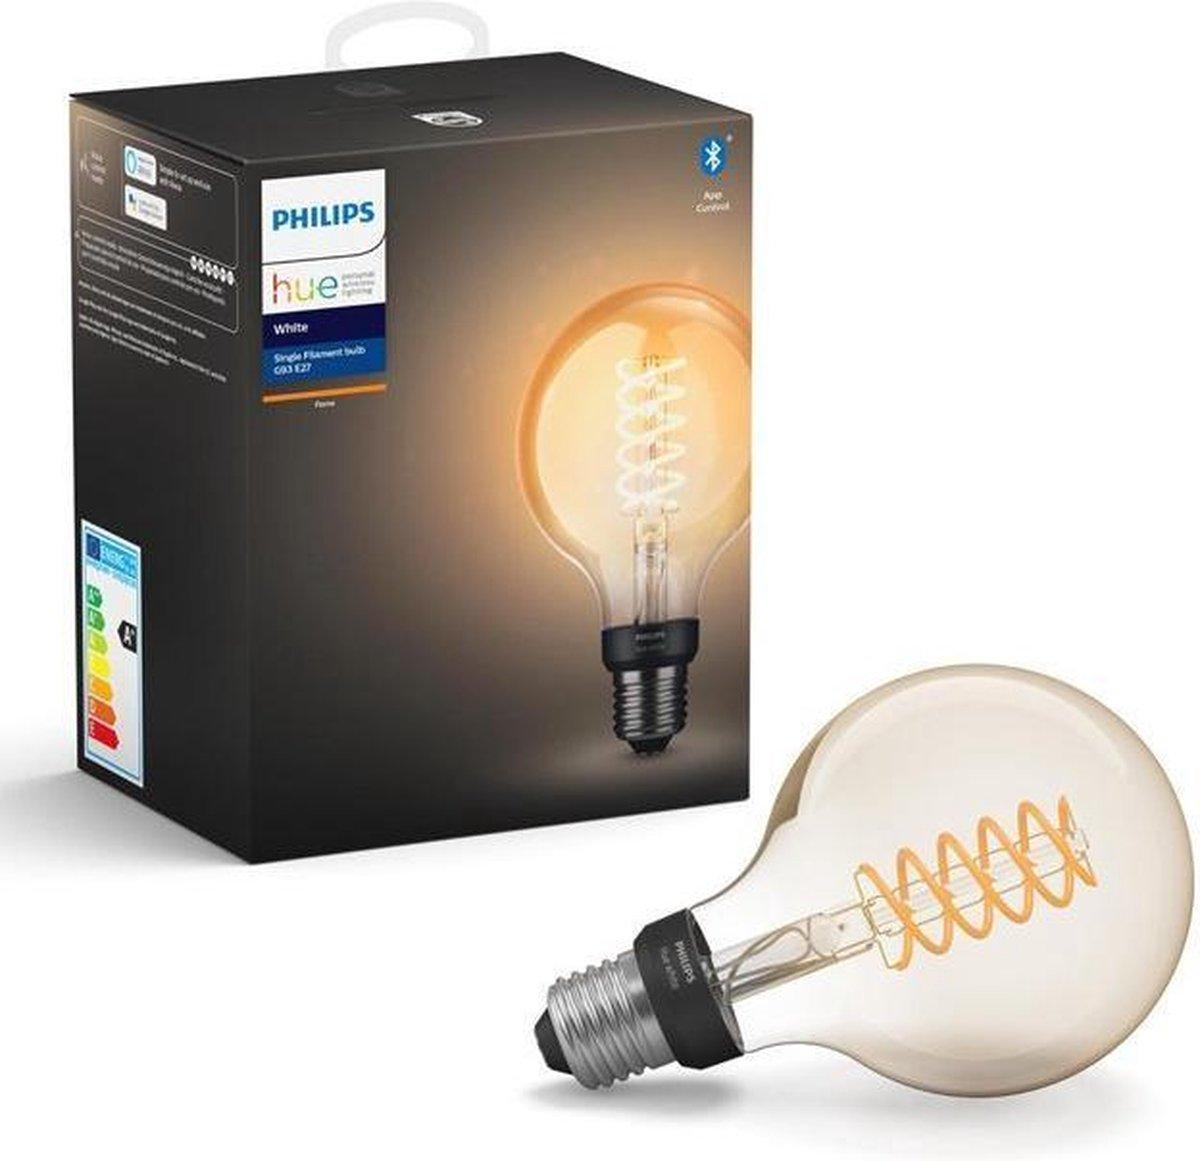 Philips Hue Slimme Verlichting Filamentlamp G93 Globe -   9,5 cm - White - E27 - Bluetooth